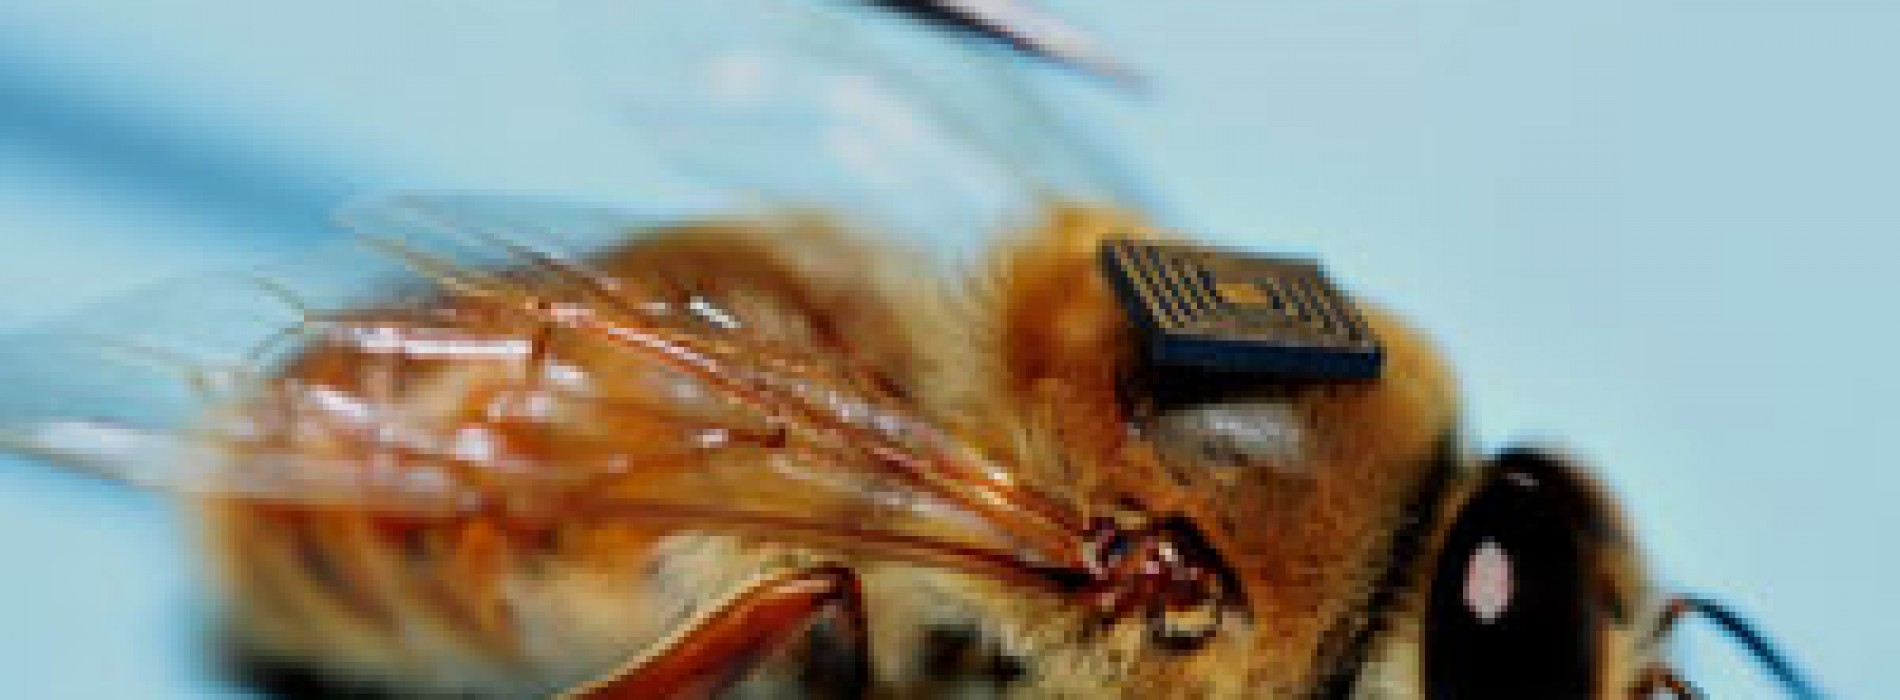 Colocan microsensores en colmenas de abejas para garantizar provisión de alimentos